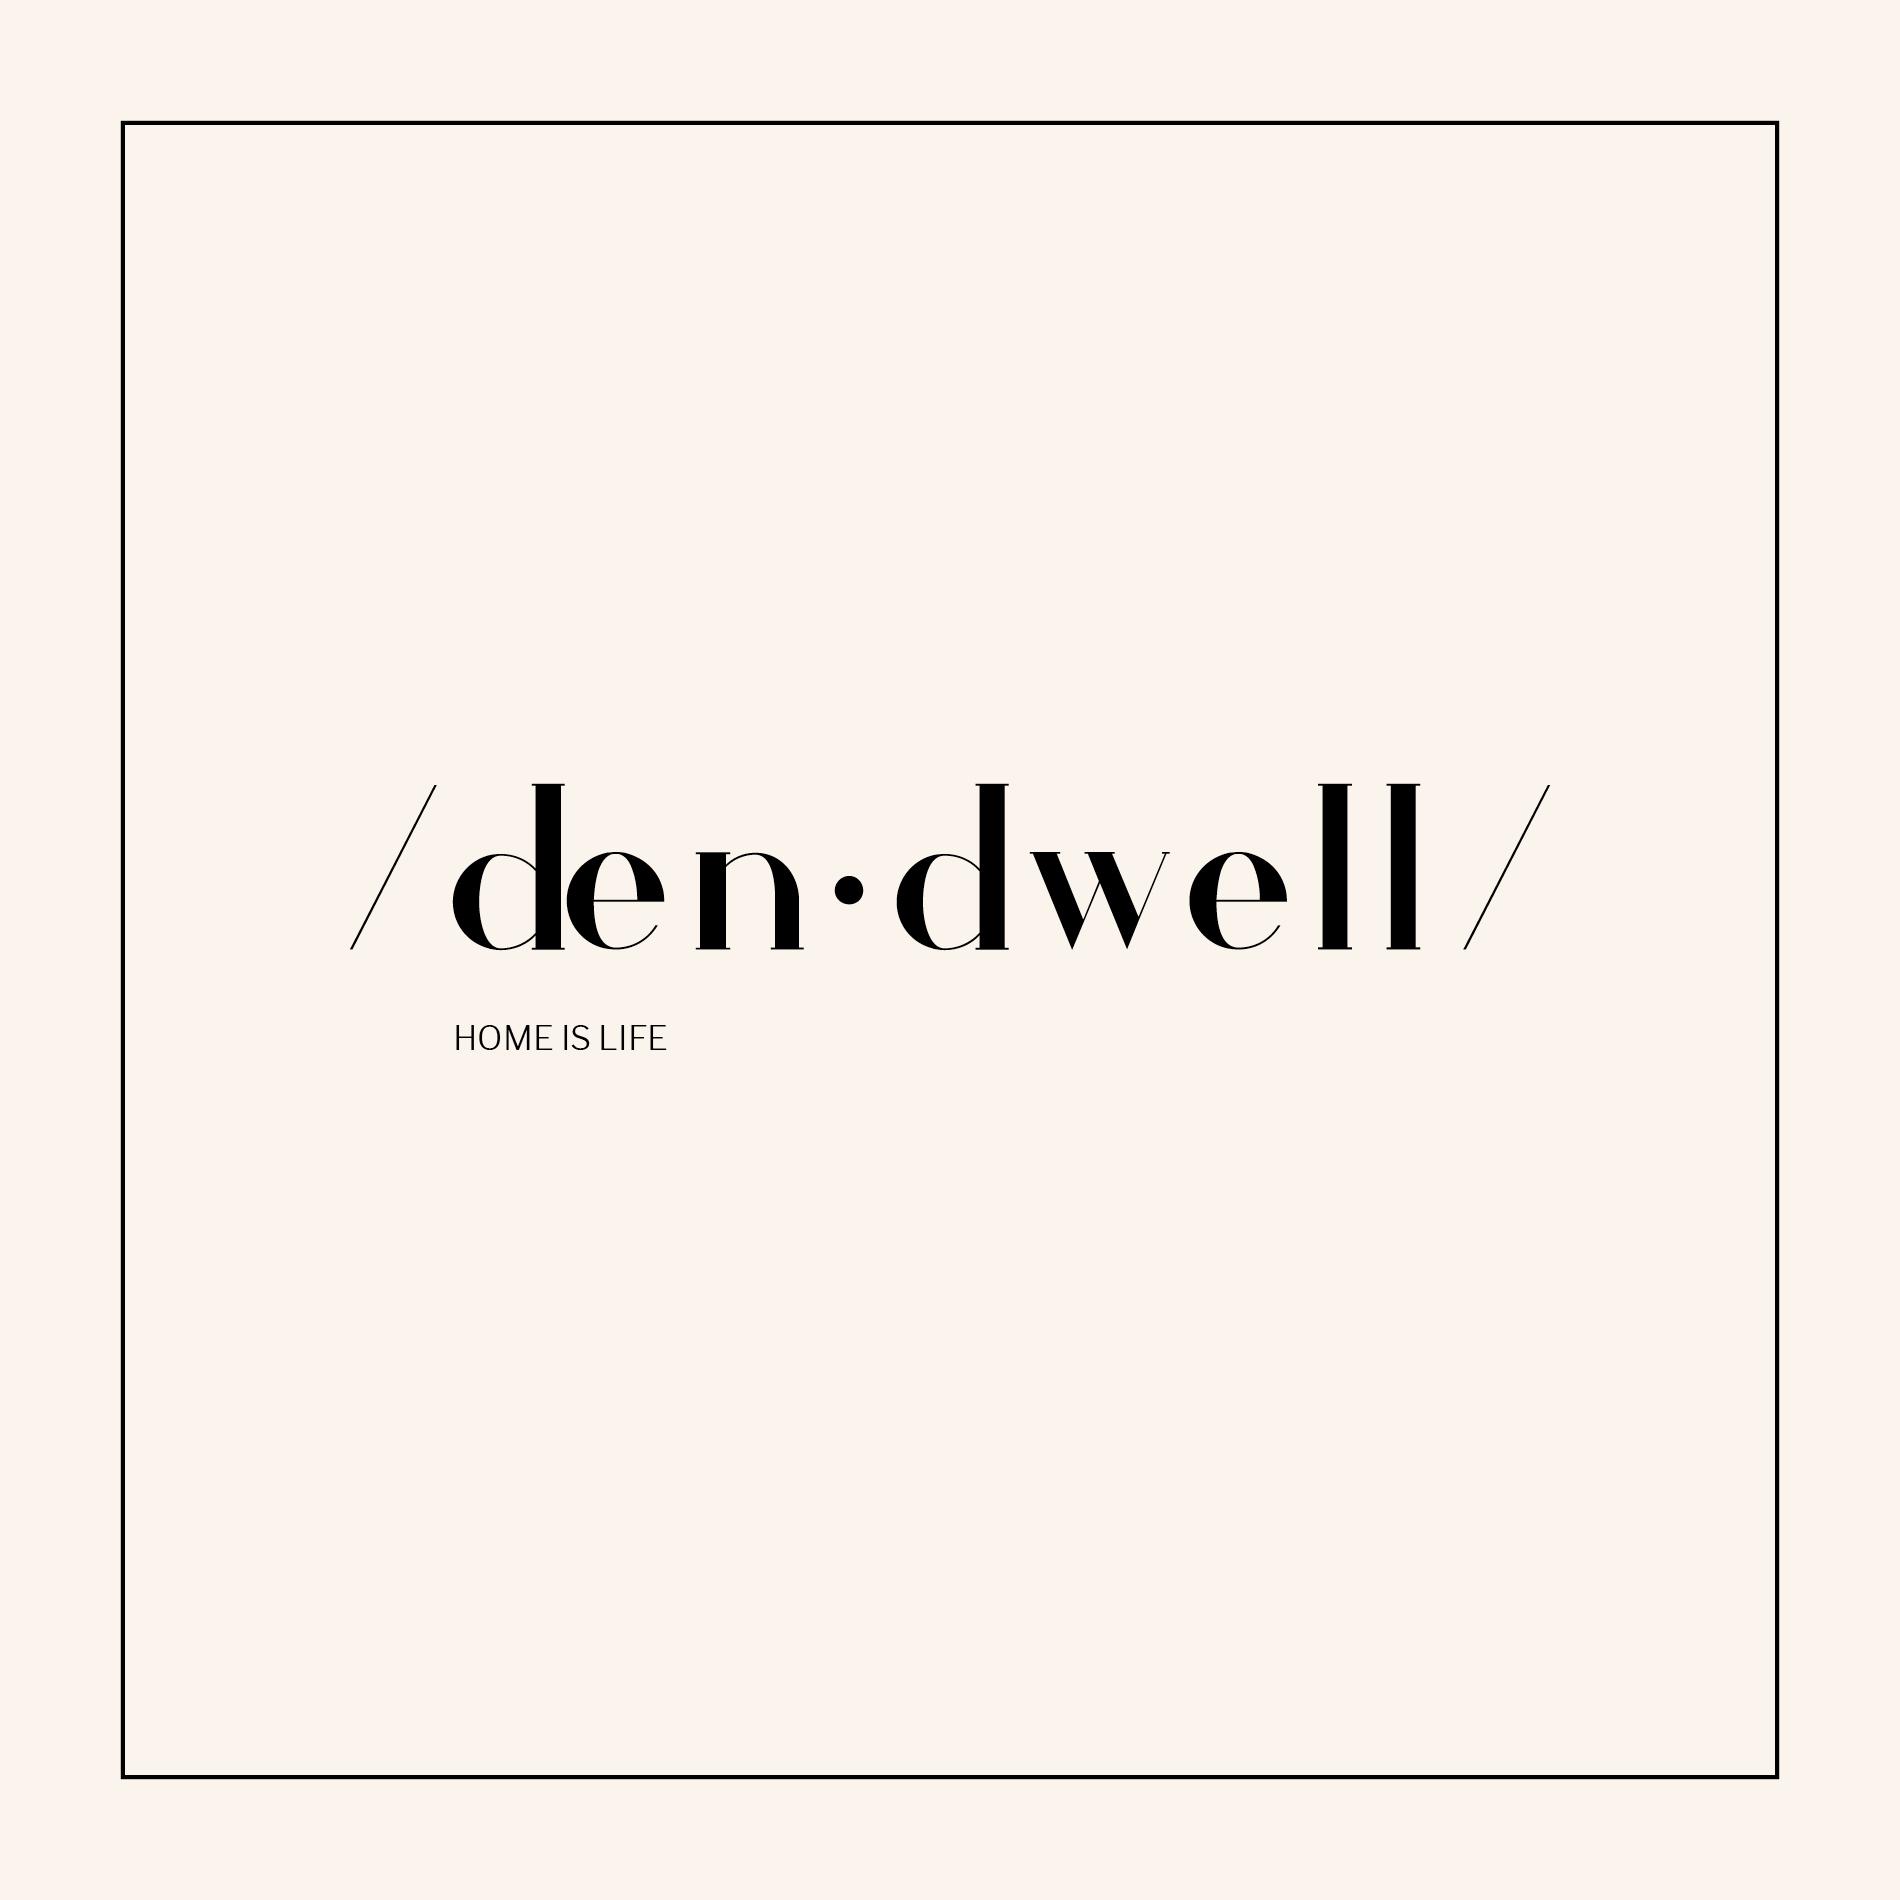 Dendwell_BrandBook_2020.jpg